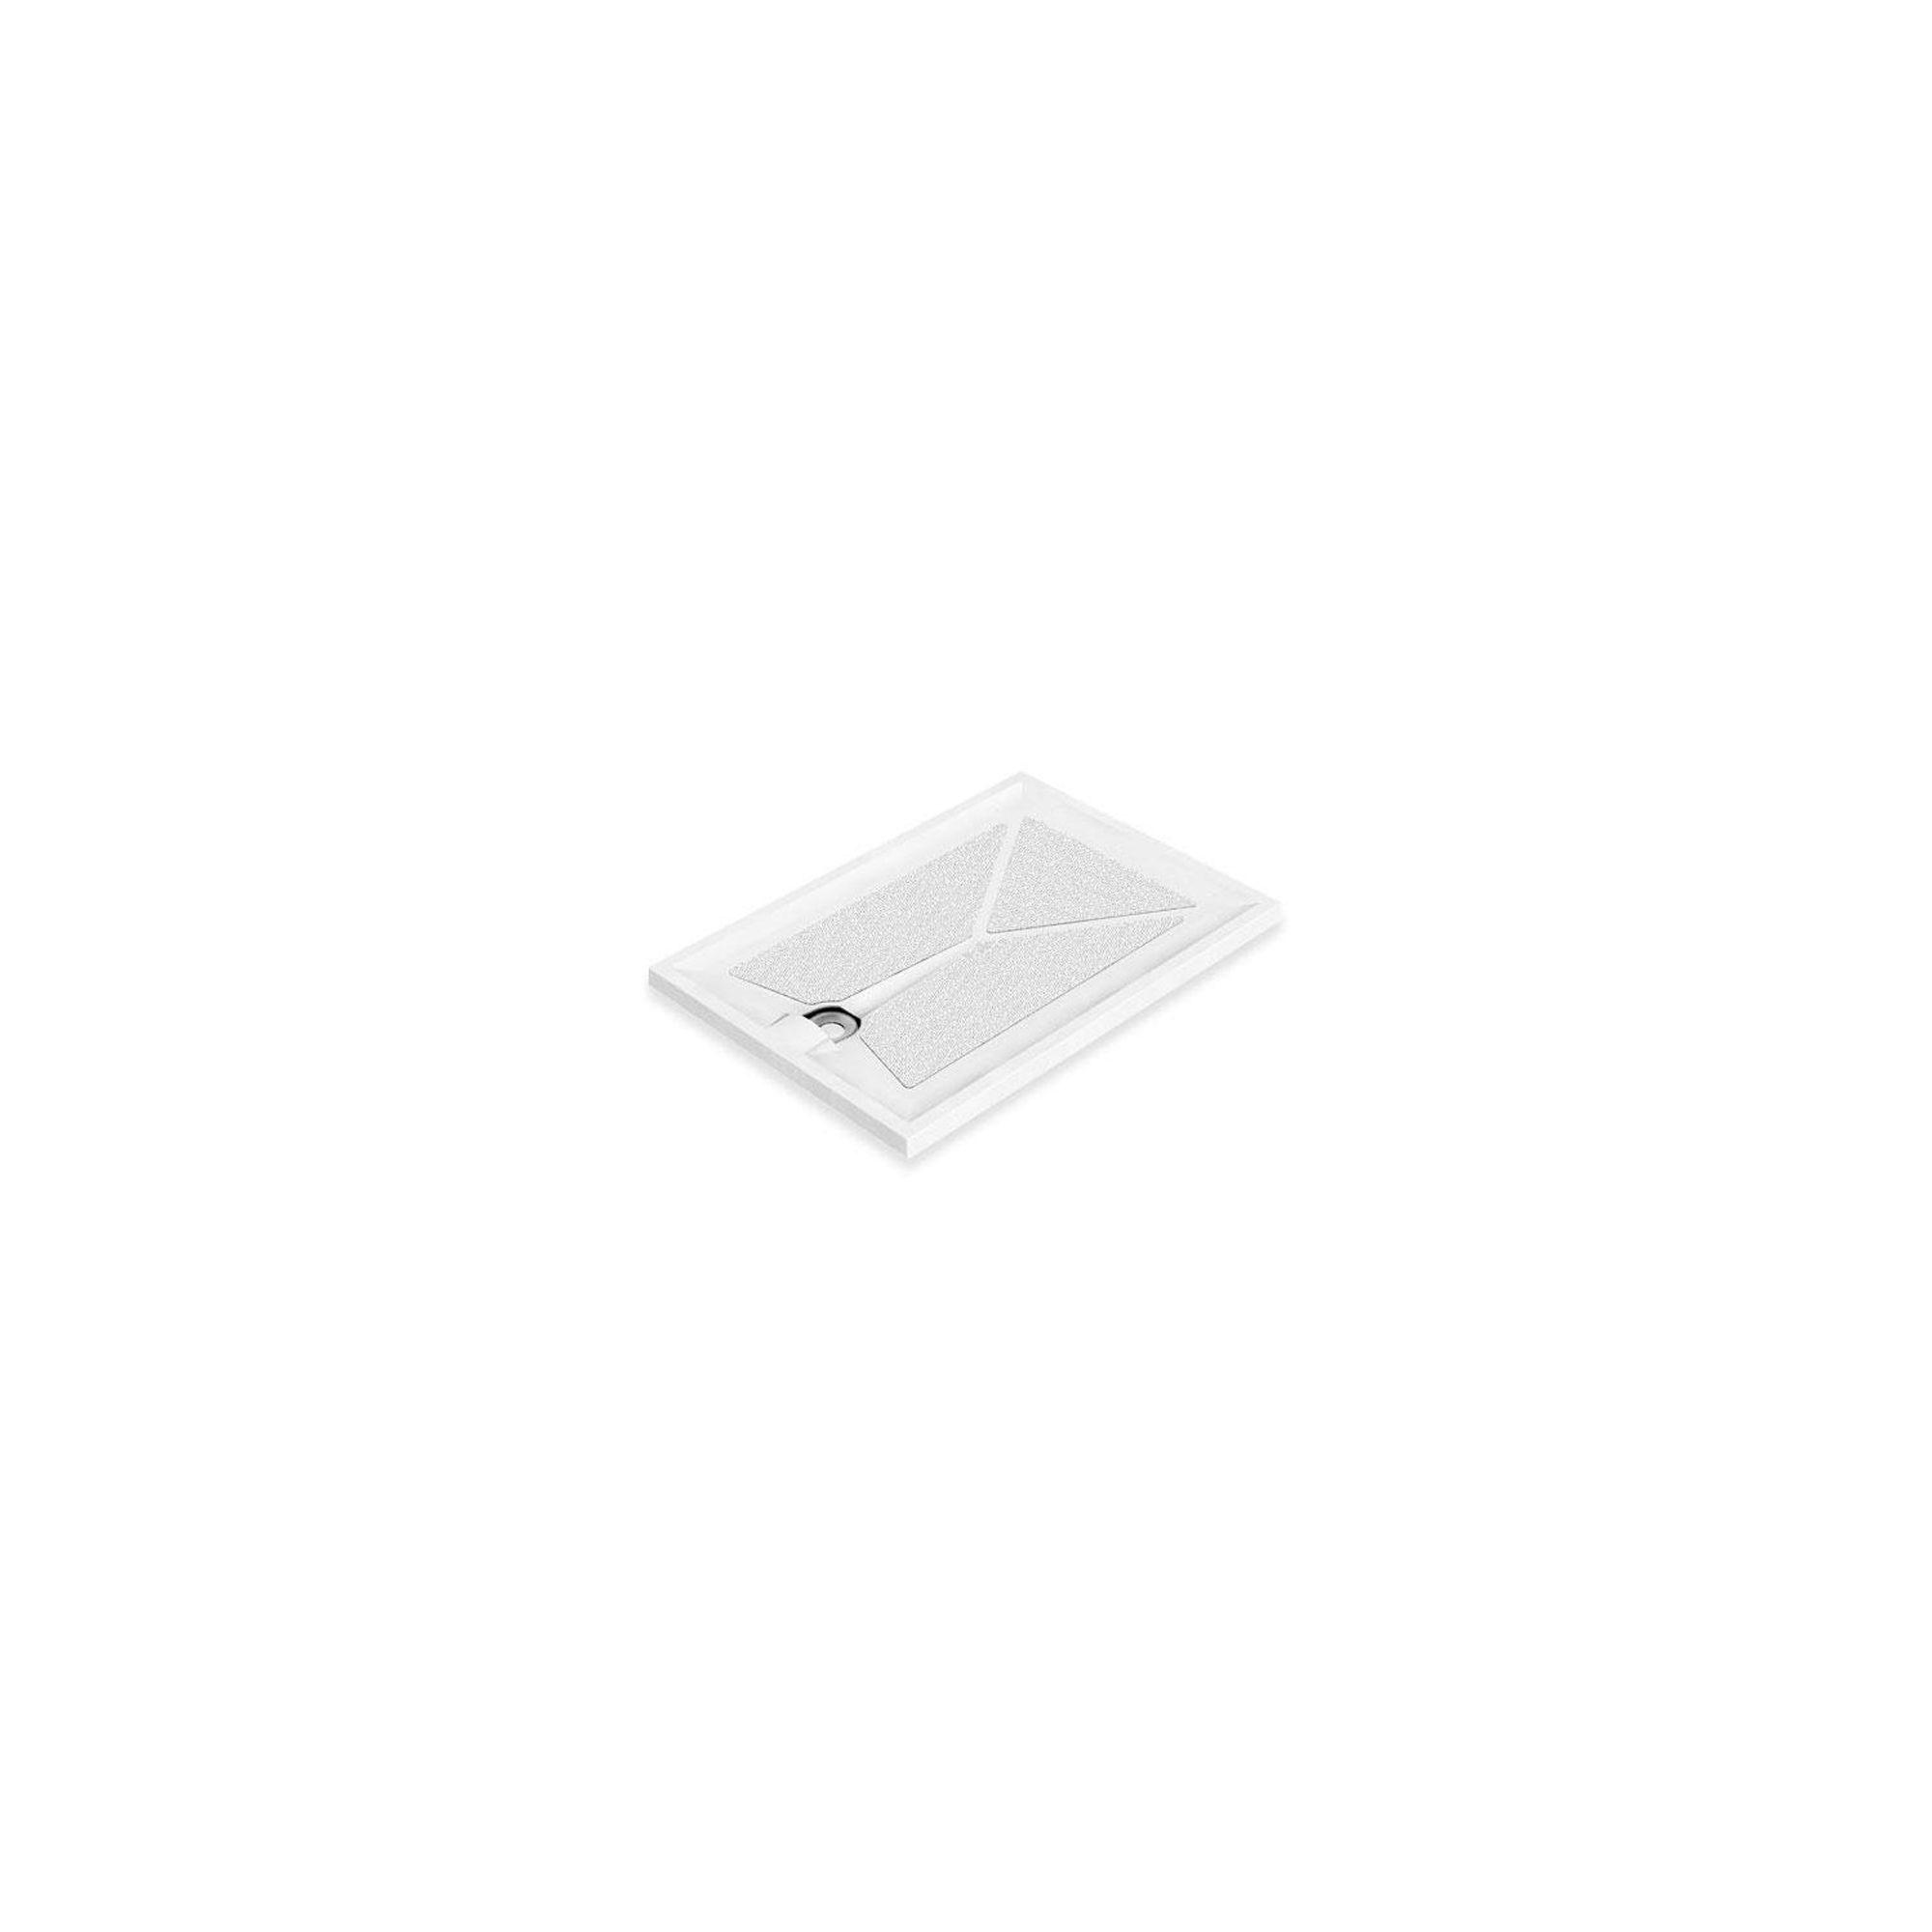 AKW Braddan Rectangular Shower Tray 1200mm x 700mm at Tesco Direct